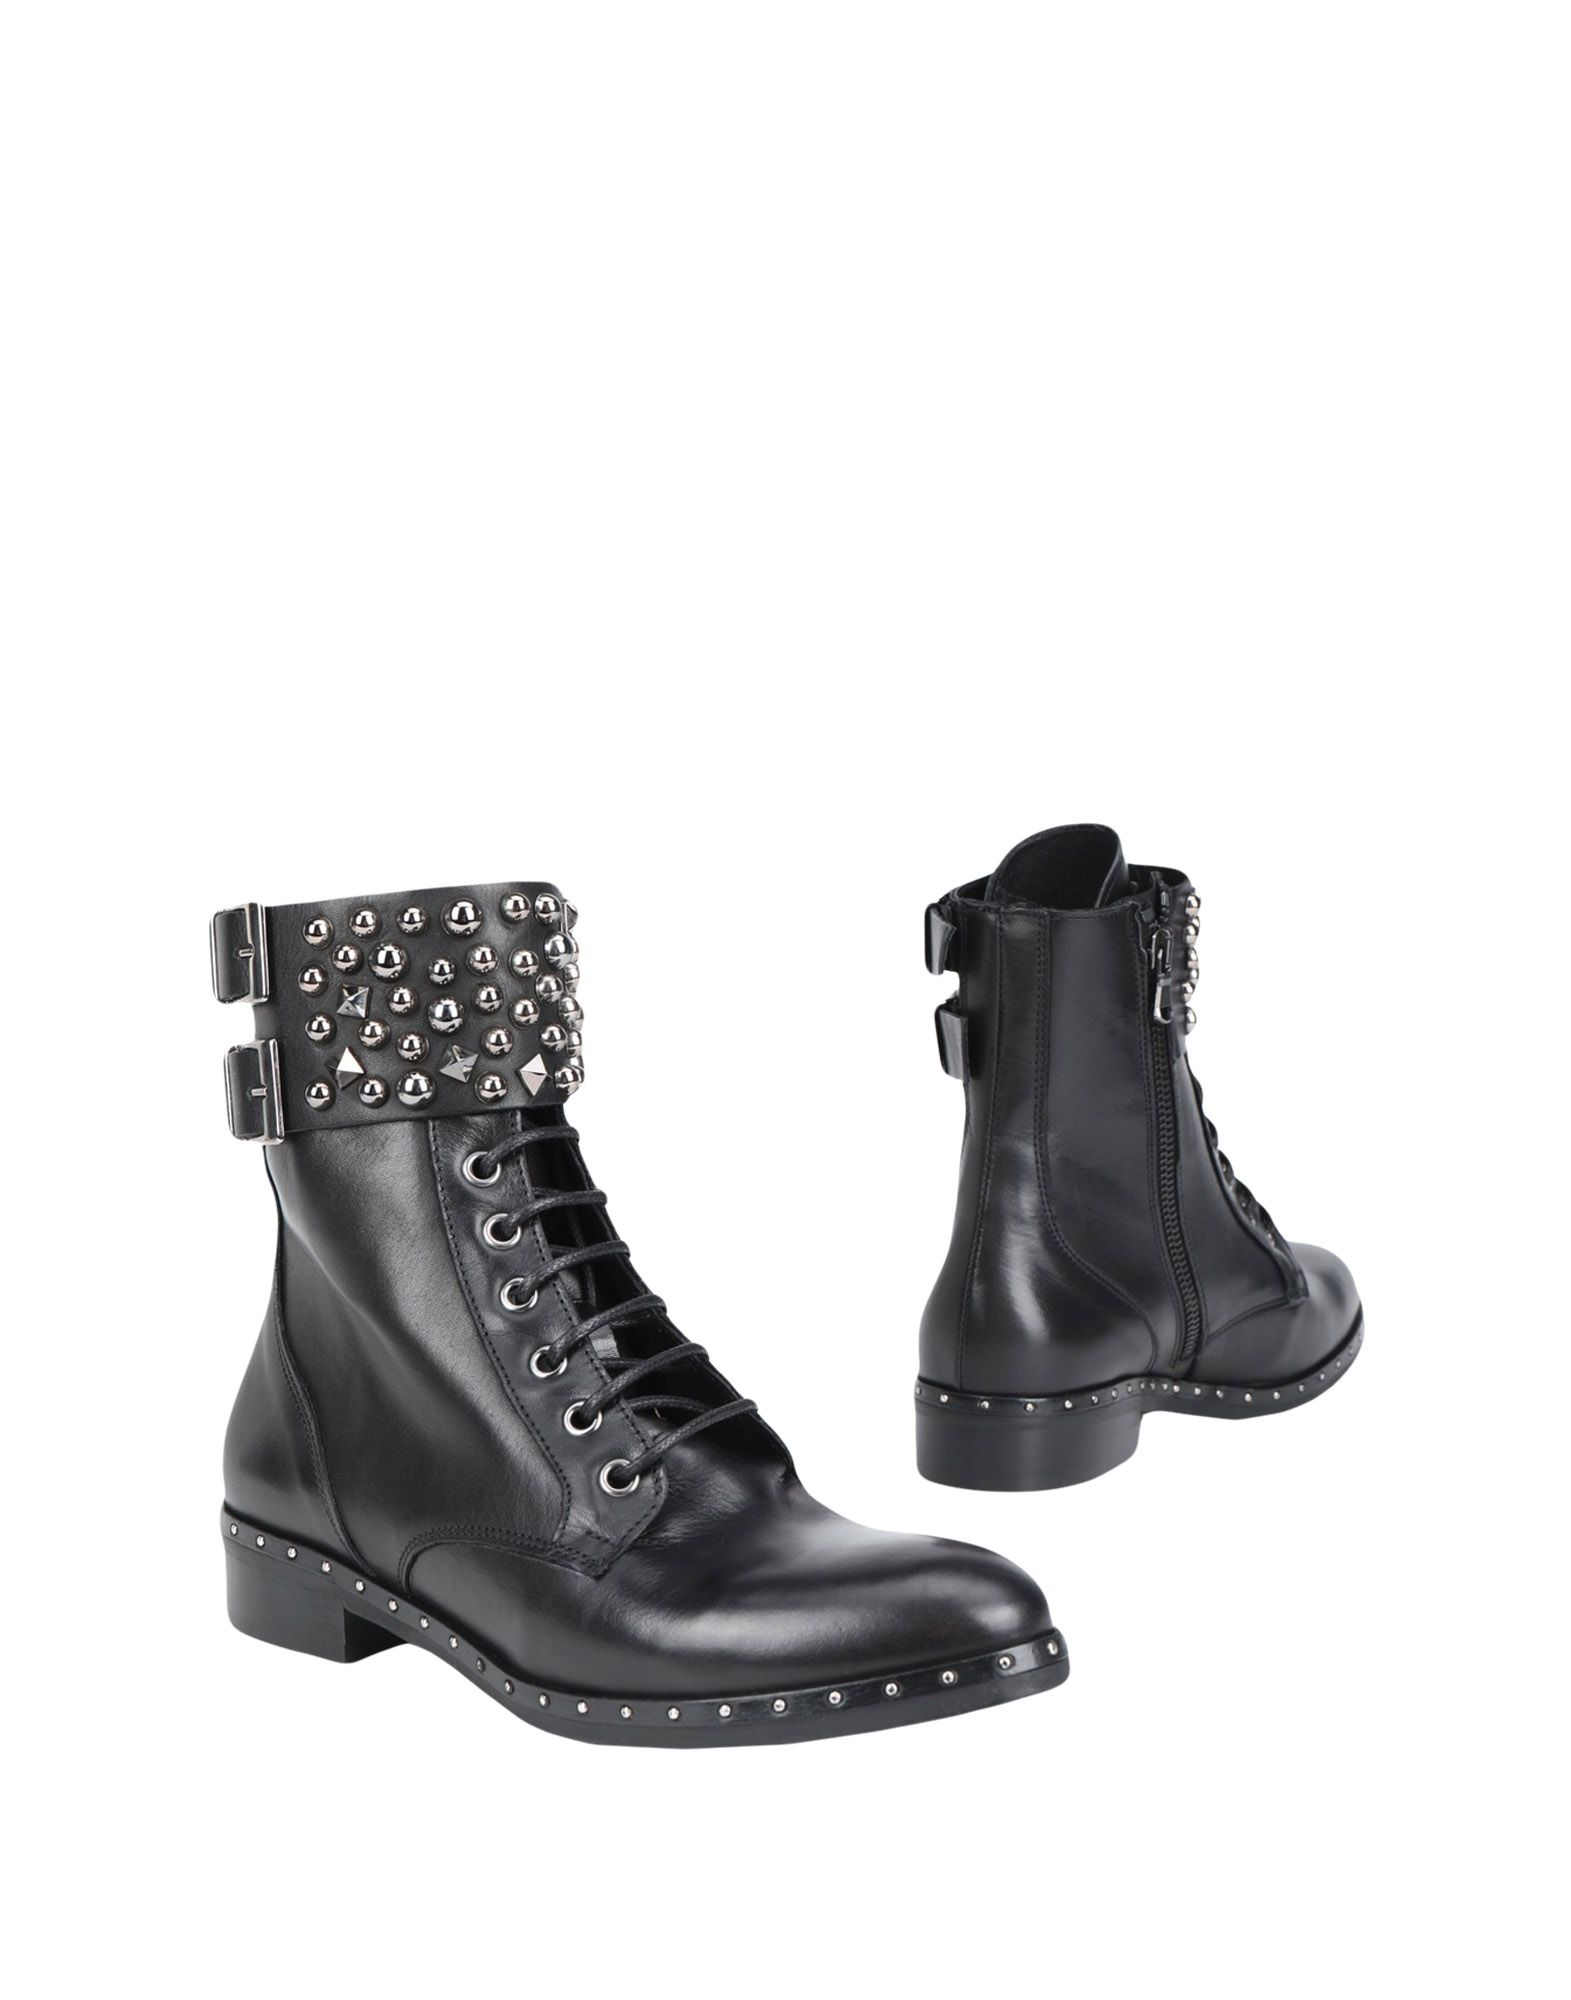 Stilvolle Creatyve billige Schuhe Red Creatyve Stilvolle Stiefelette Damen  11534854AP c8b824